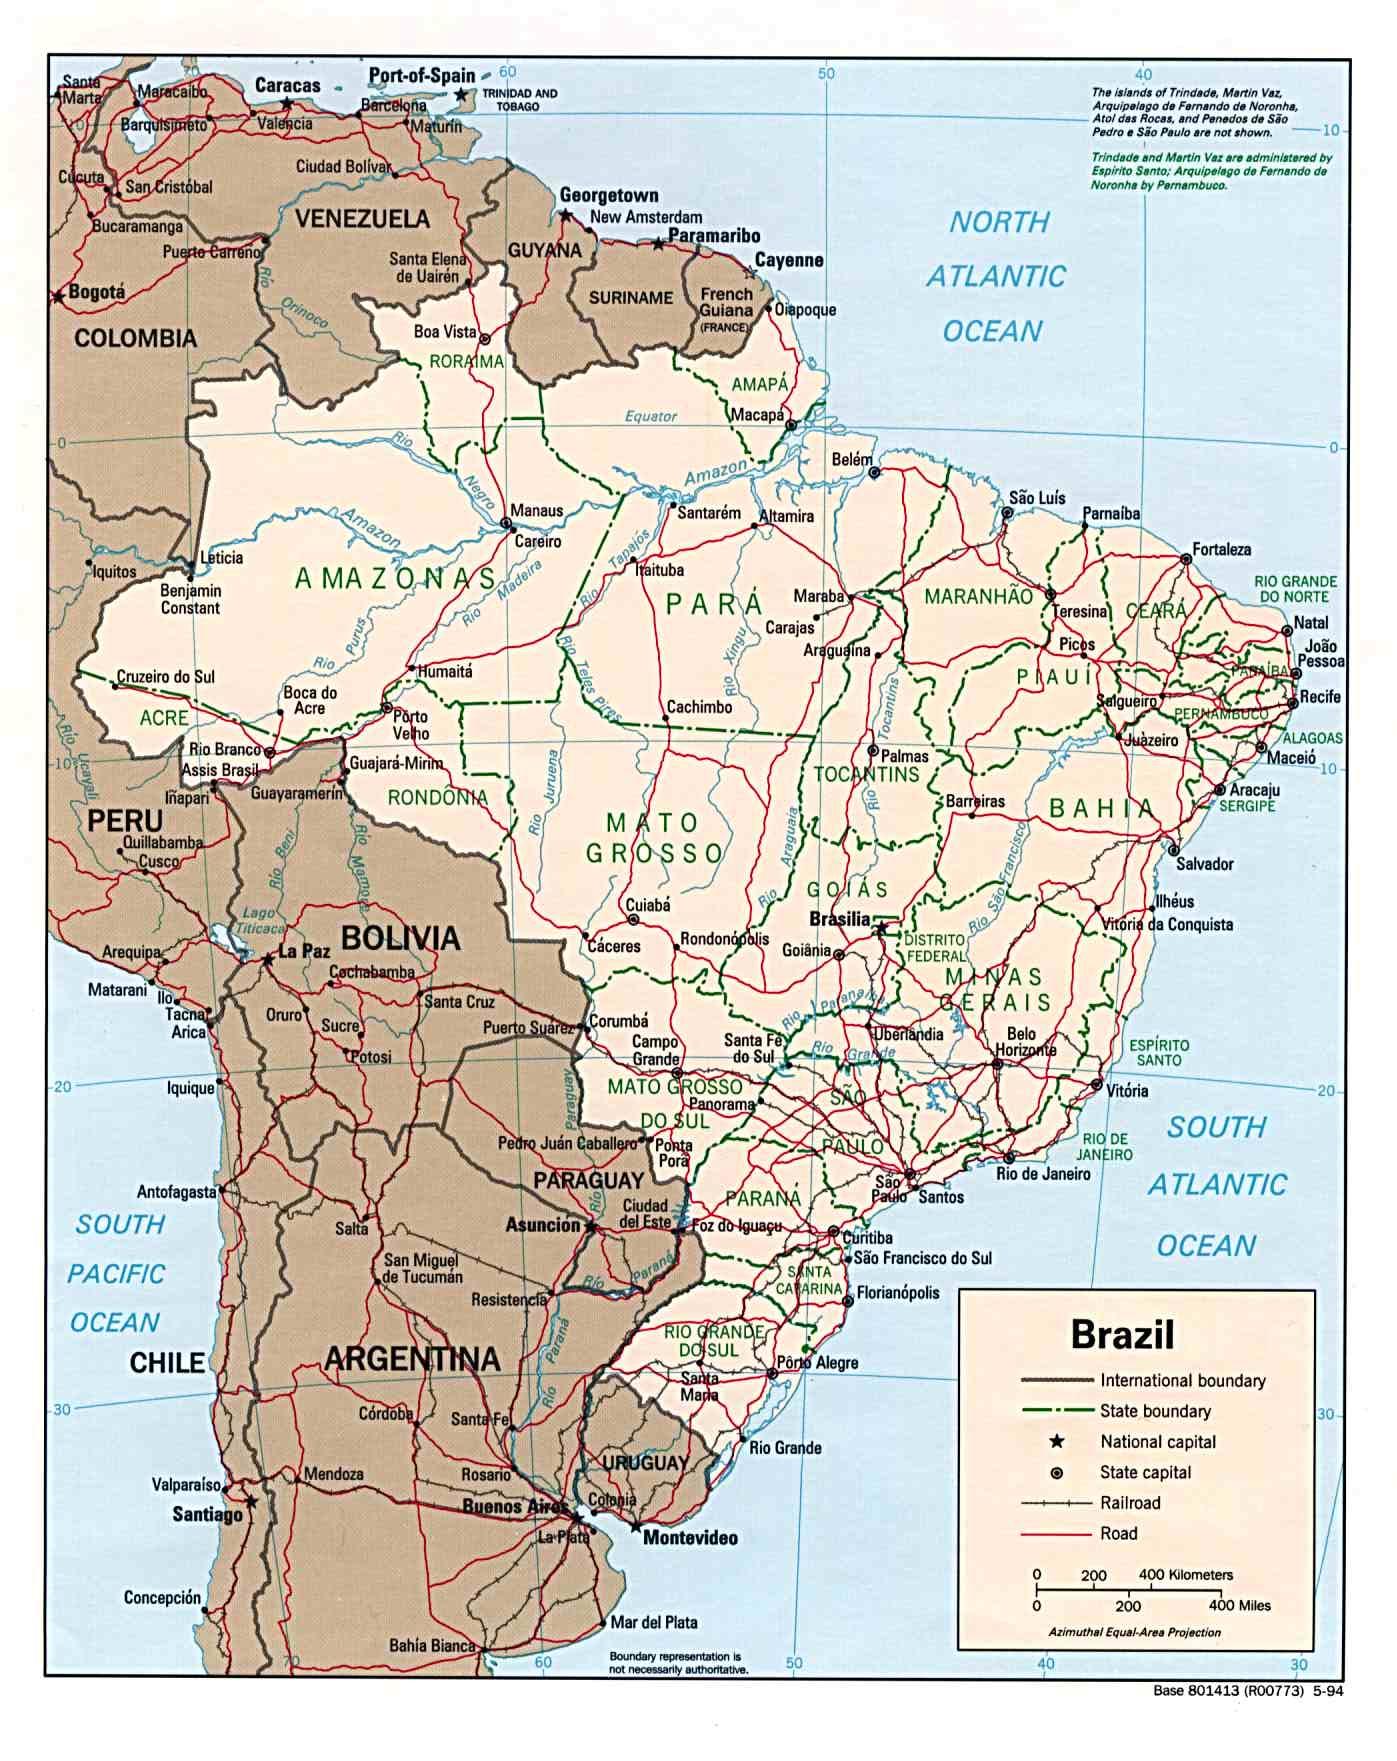 Brasilien Karte Welt.Landkarte Brasilien Politische Karte Weltkarte Com Karten Und